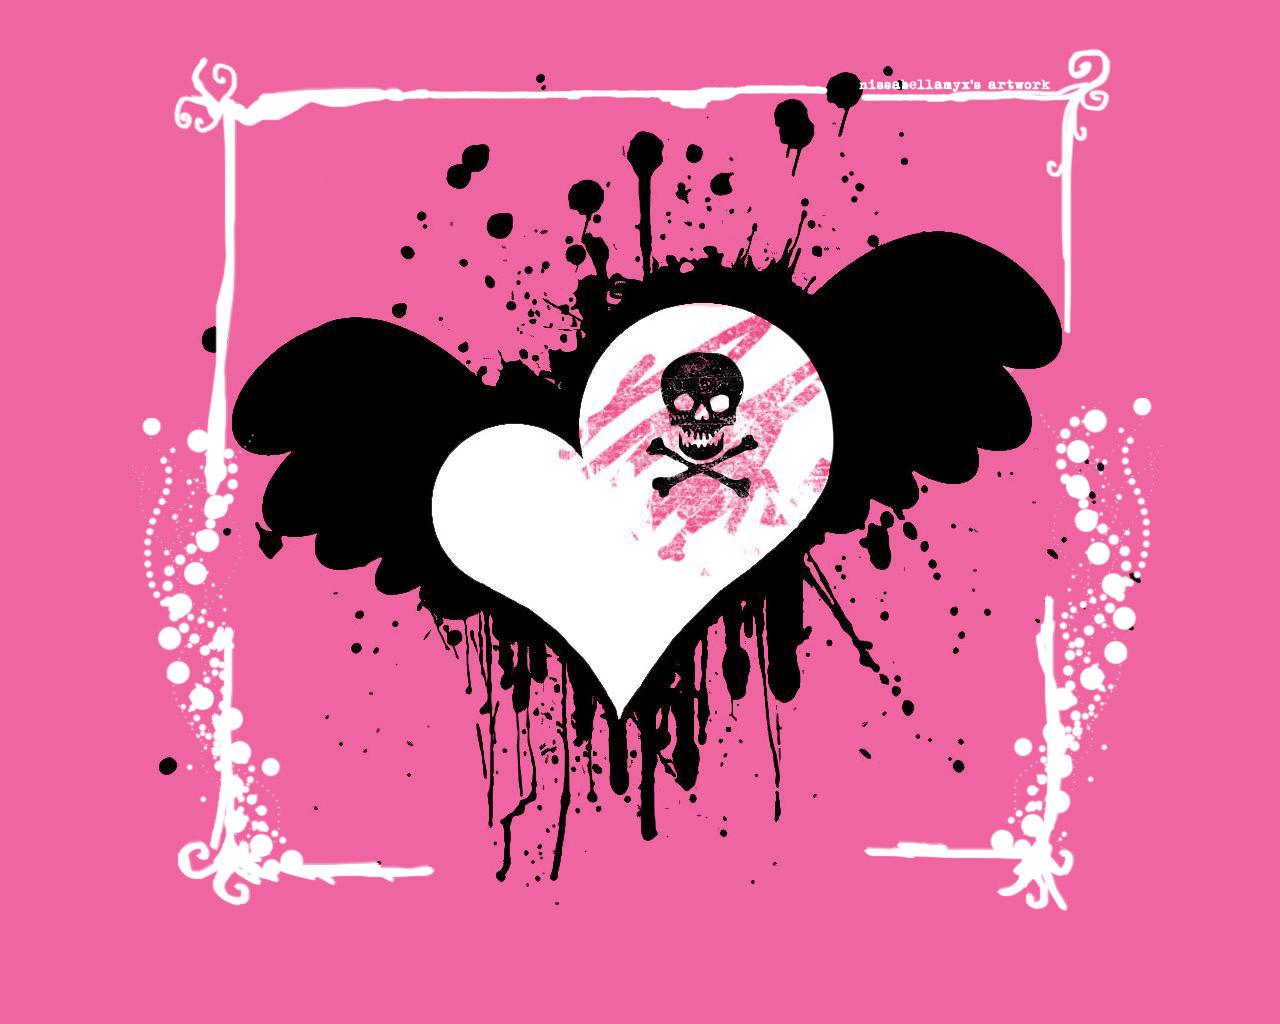 http://3.bp.blogspot.com/-bJq2Y7OmCI4/ThymTQafv0I/AAAAAAAAIGU/MZ1tIyCHX0o/s1600/pink+skull+wallpaper-2.jpg